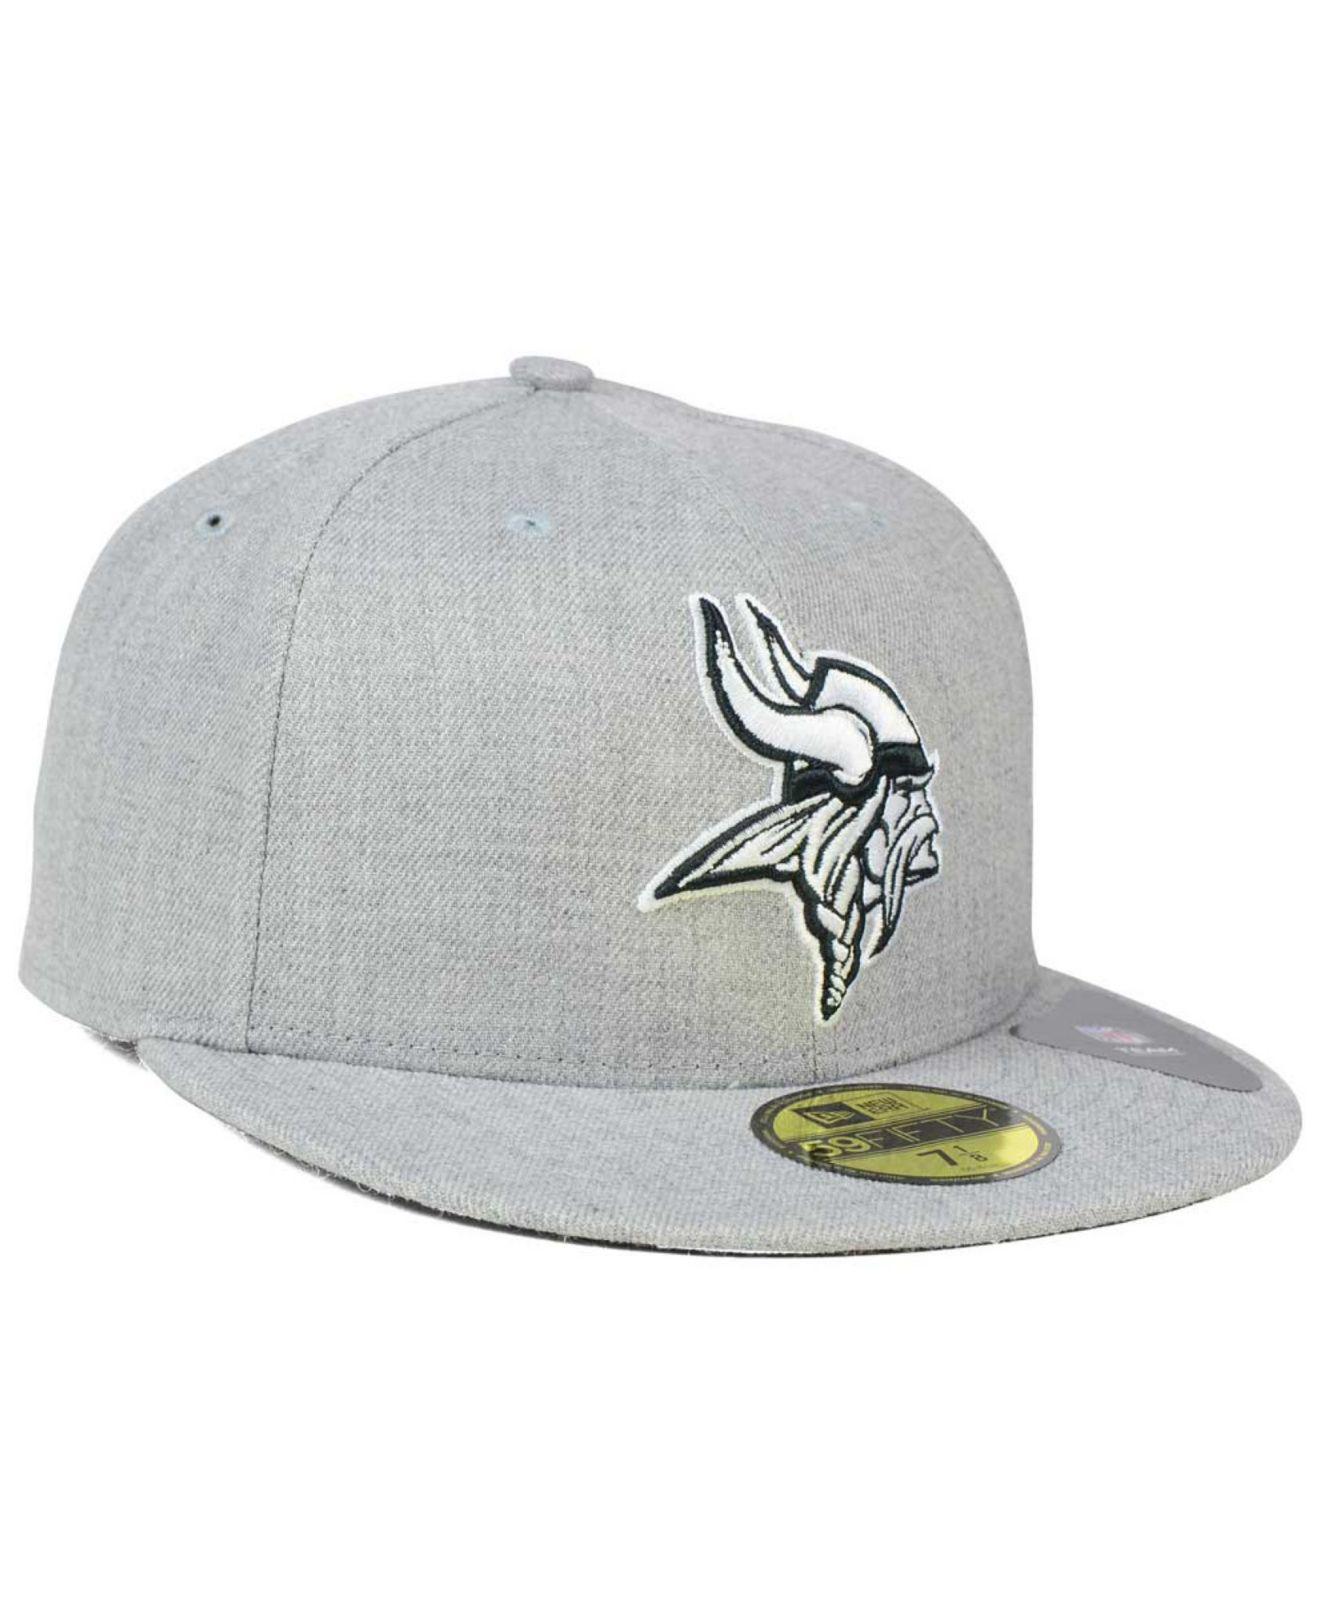 super popular 631e2 6e0fb KTZ - Gray Minnesota Vikings Heather Black White 59fifty Cap for Men -  Lyst. View fullscreen